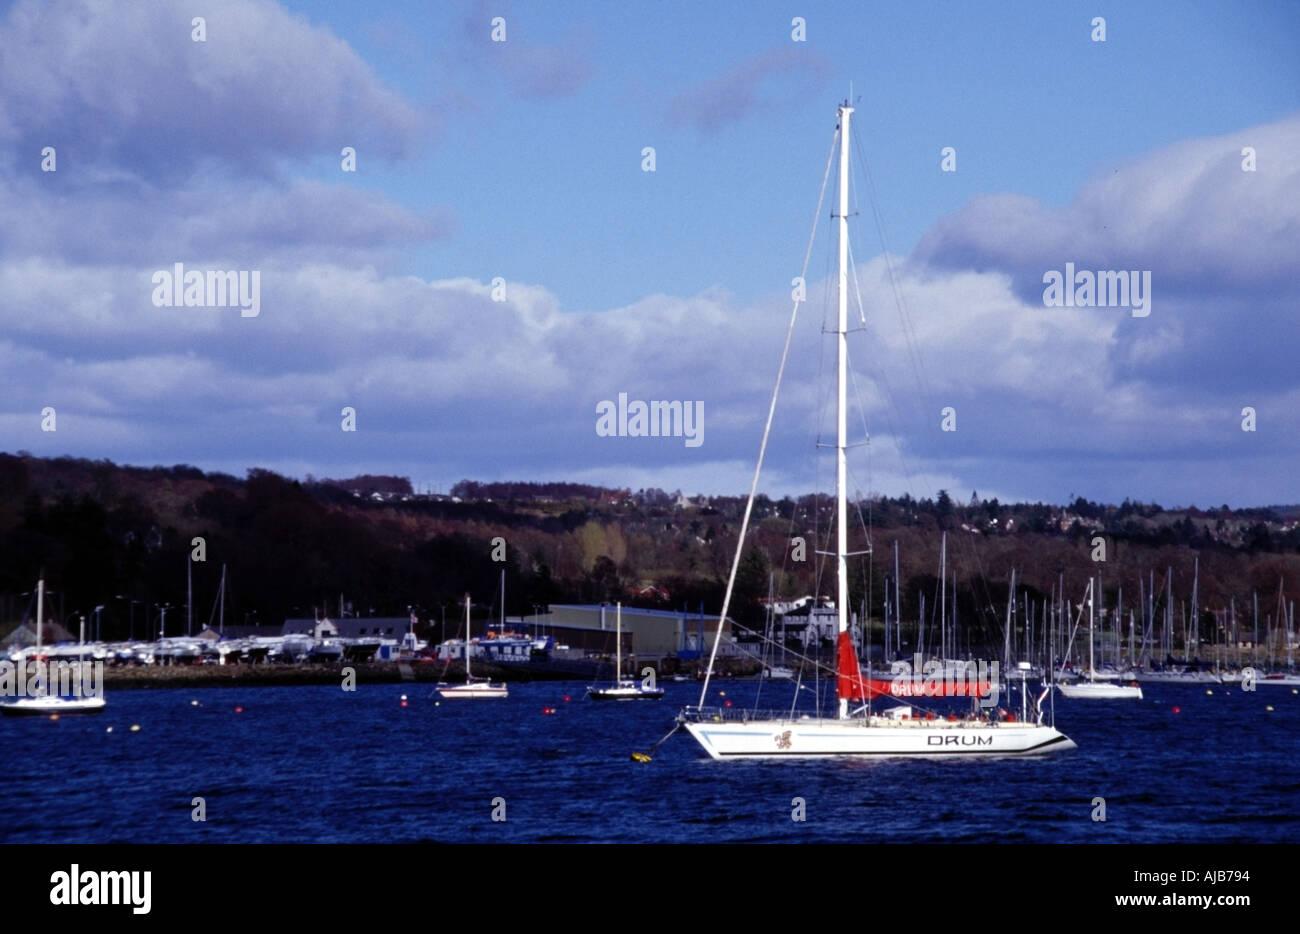 ex round the world racing yacht drum at rhu marina gareloch clyde estuary scotland europe - Stock Image